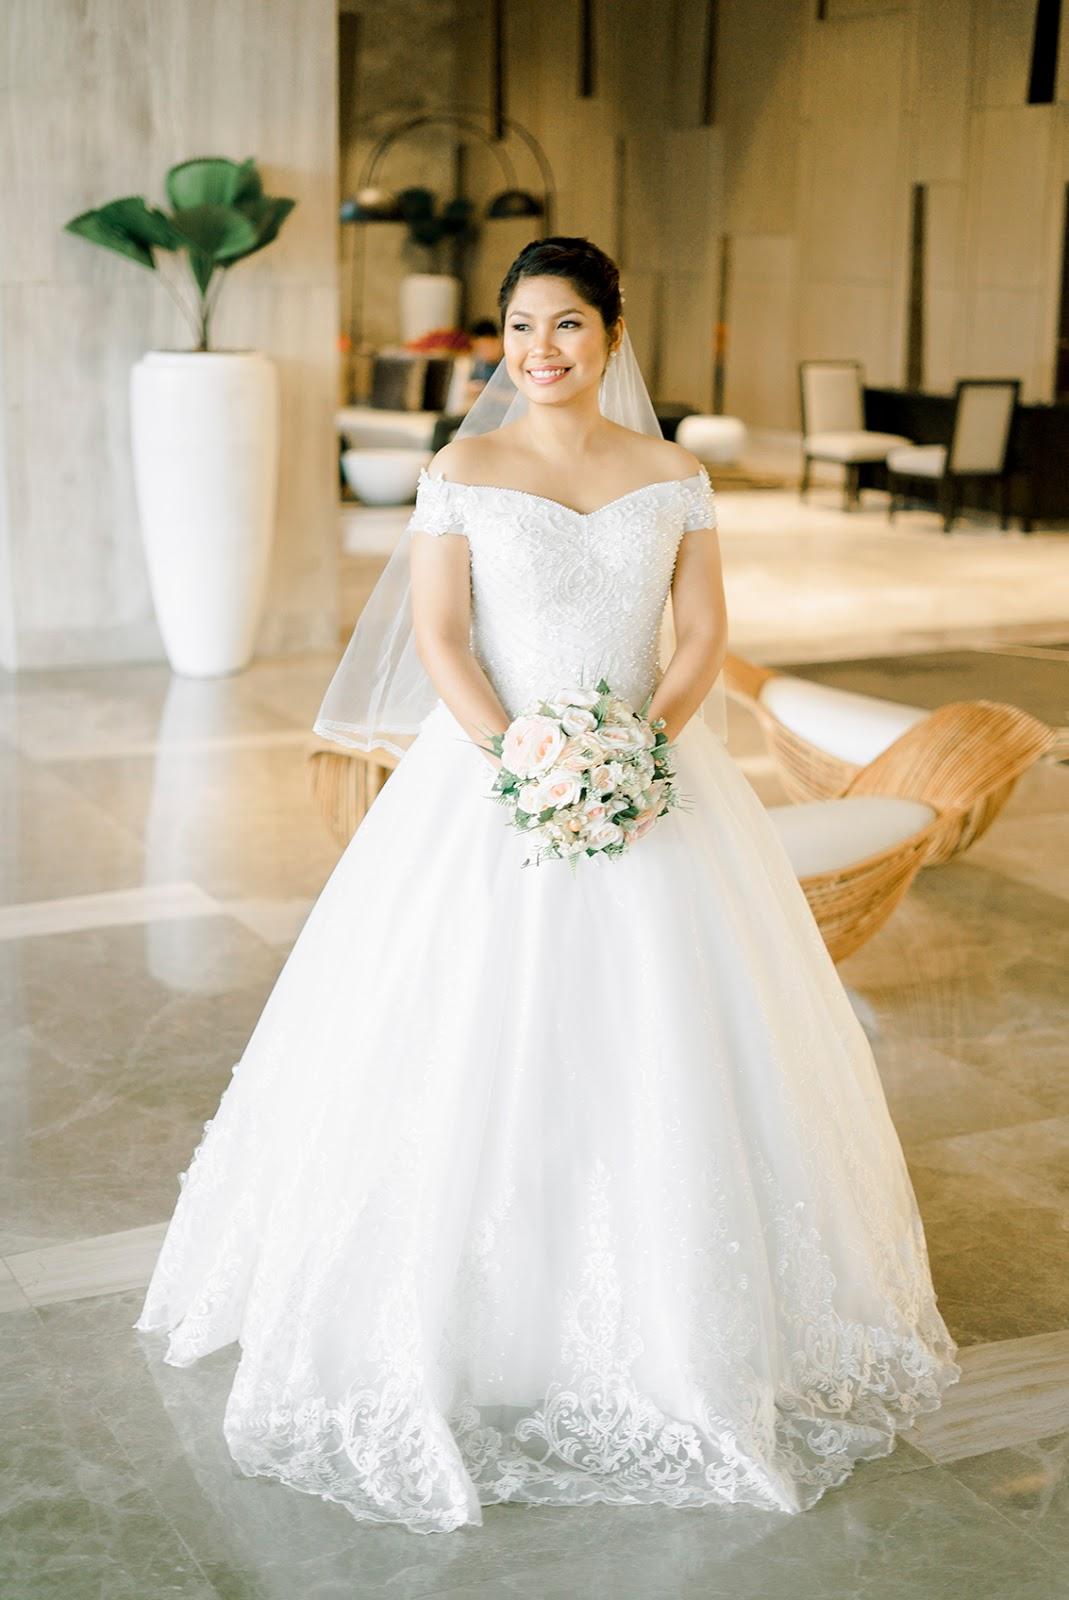 wedding gown hunt: divisoria - the blahger